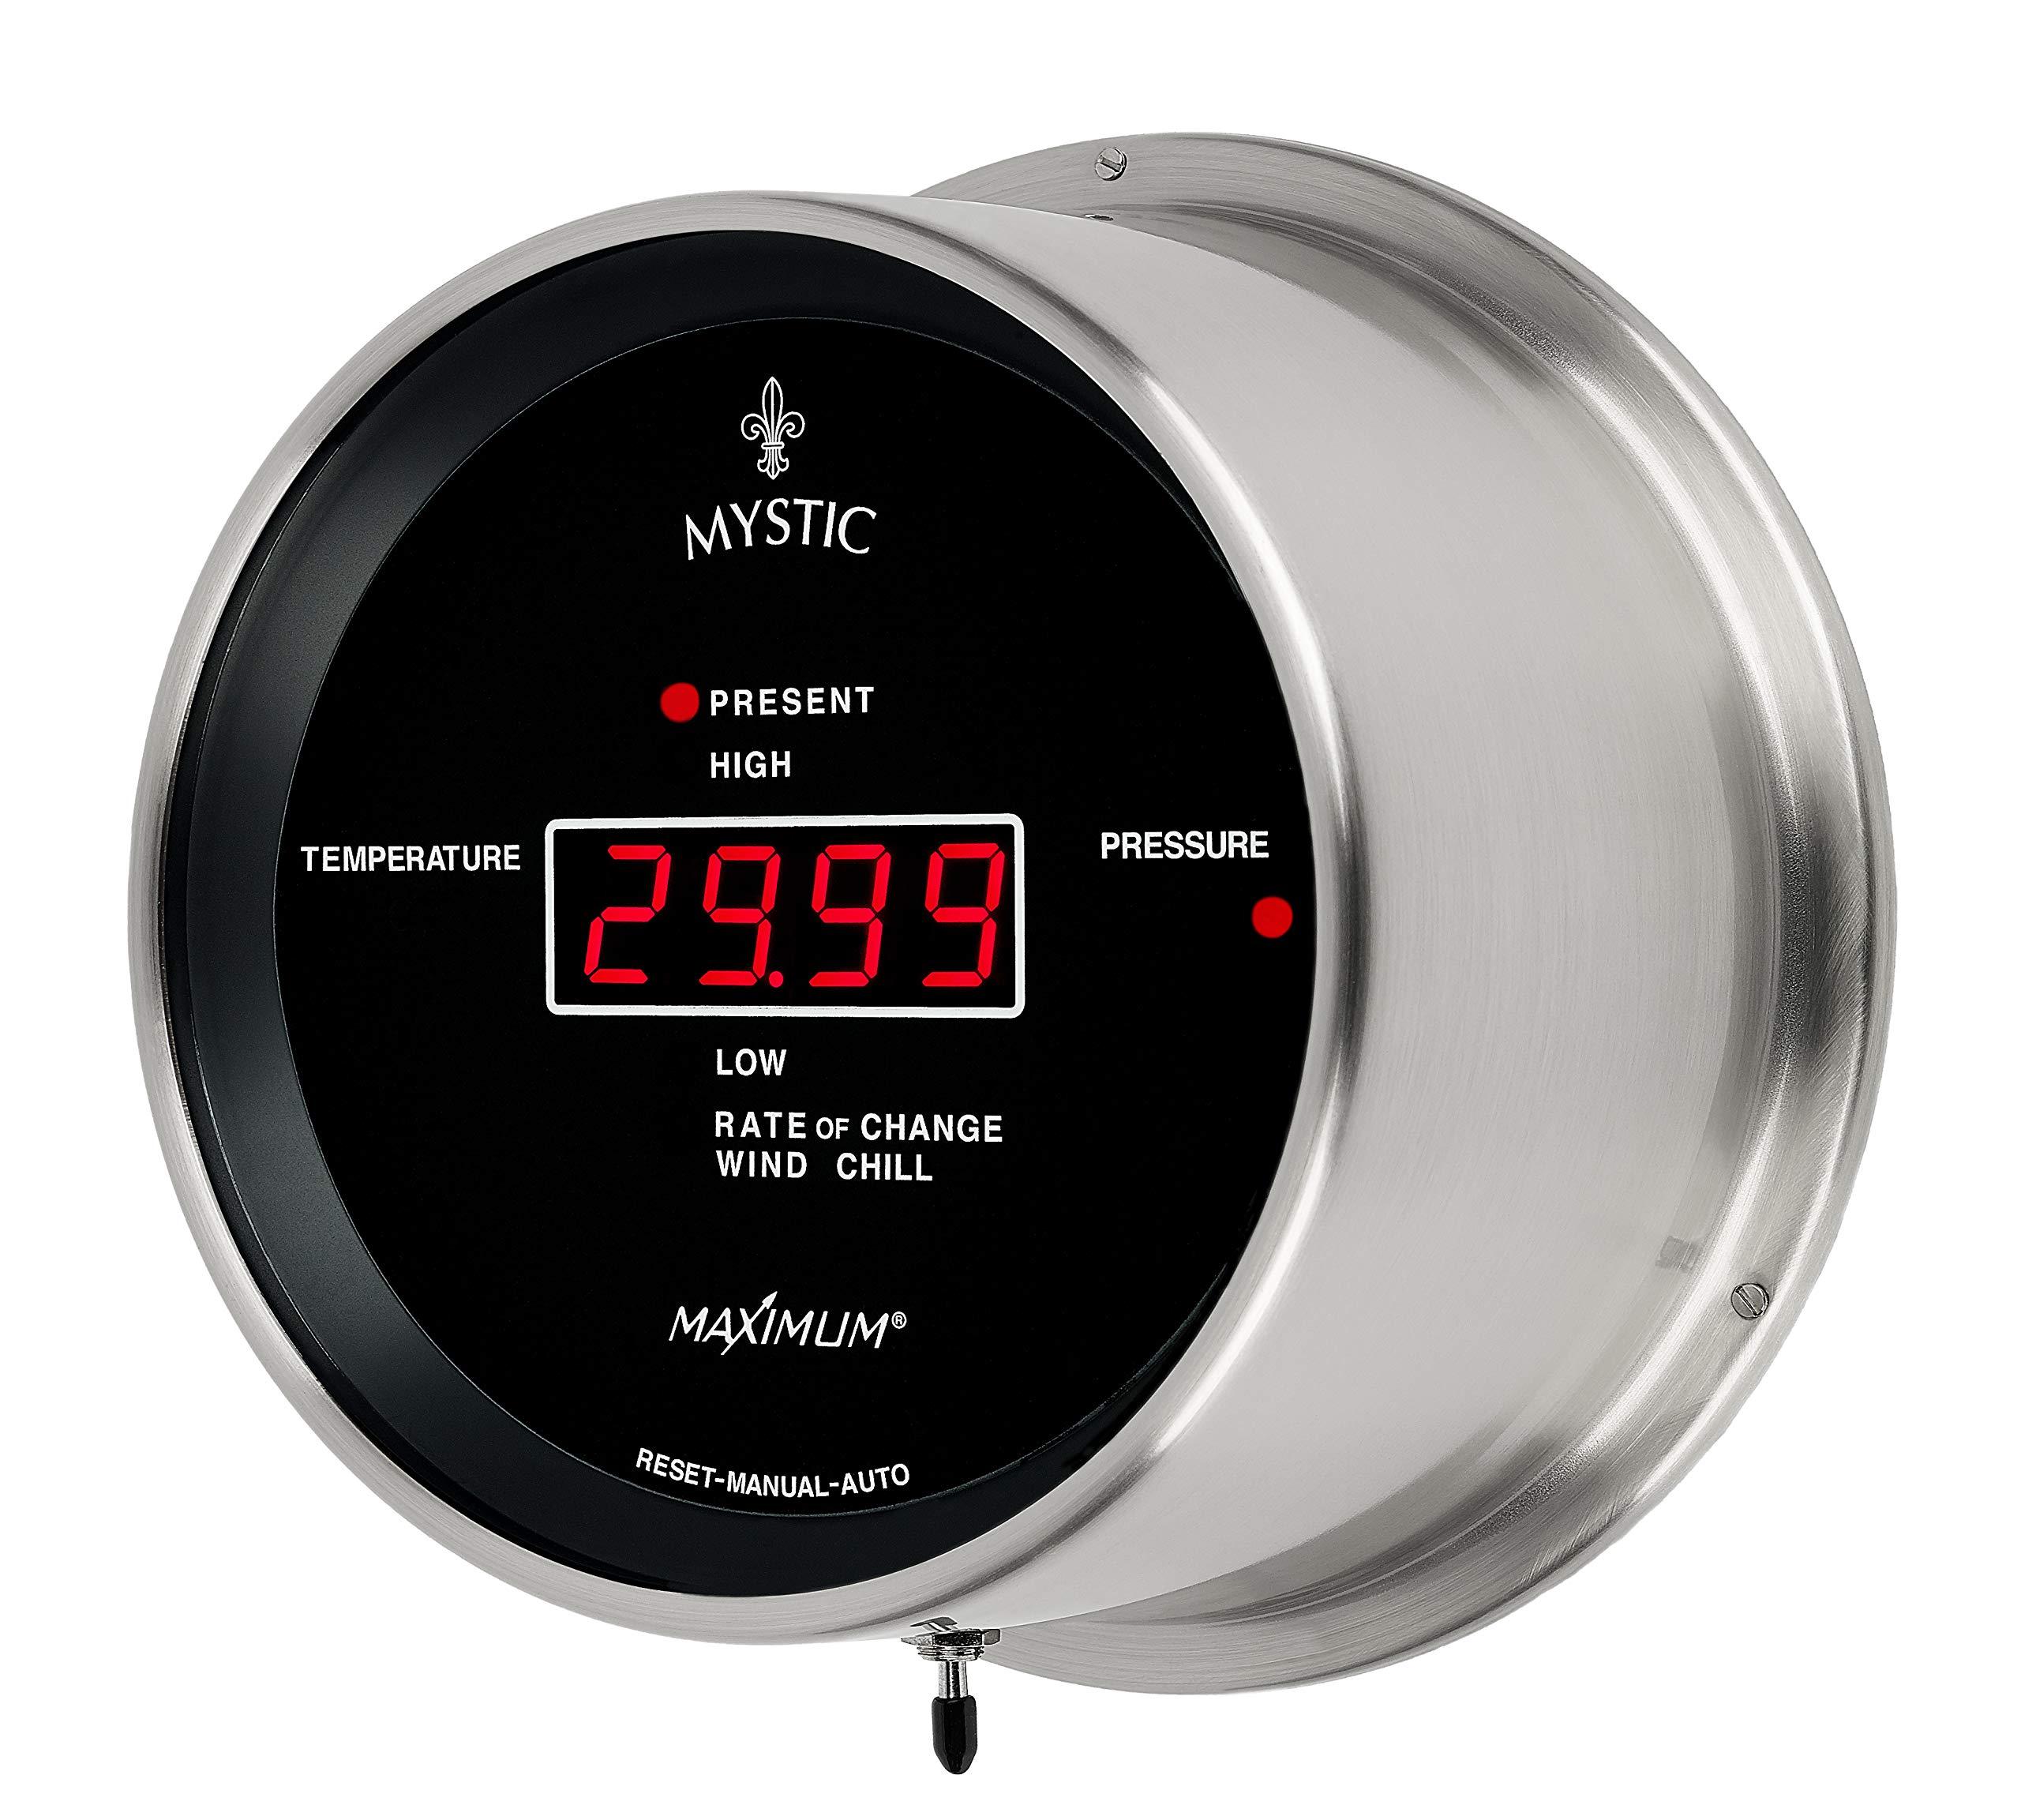 Maximum Weather Instruments Mystic Digital Thermometer/Barometer – Nickel case, Black dial